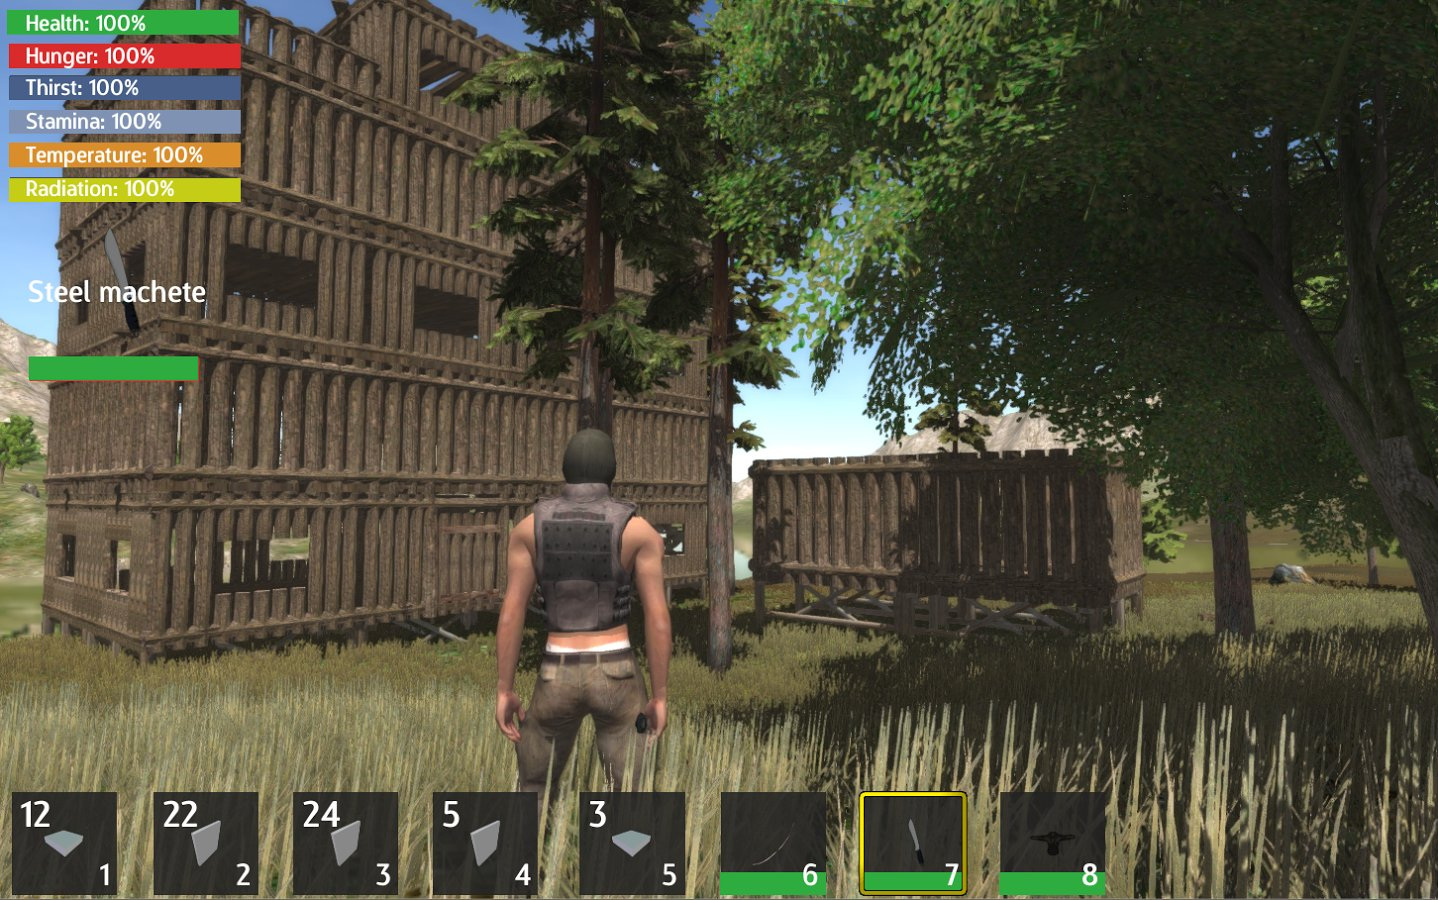 Скачать thrive island free 2. 32 для android.